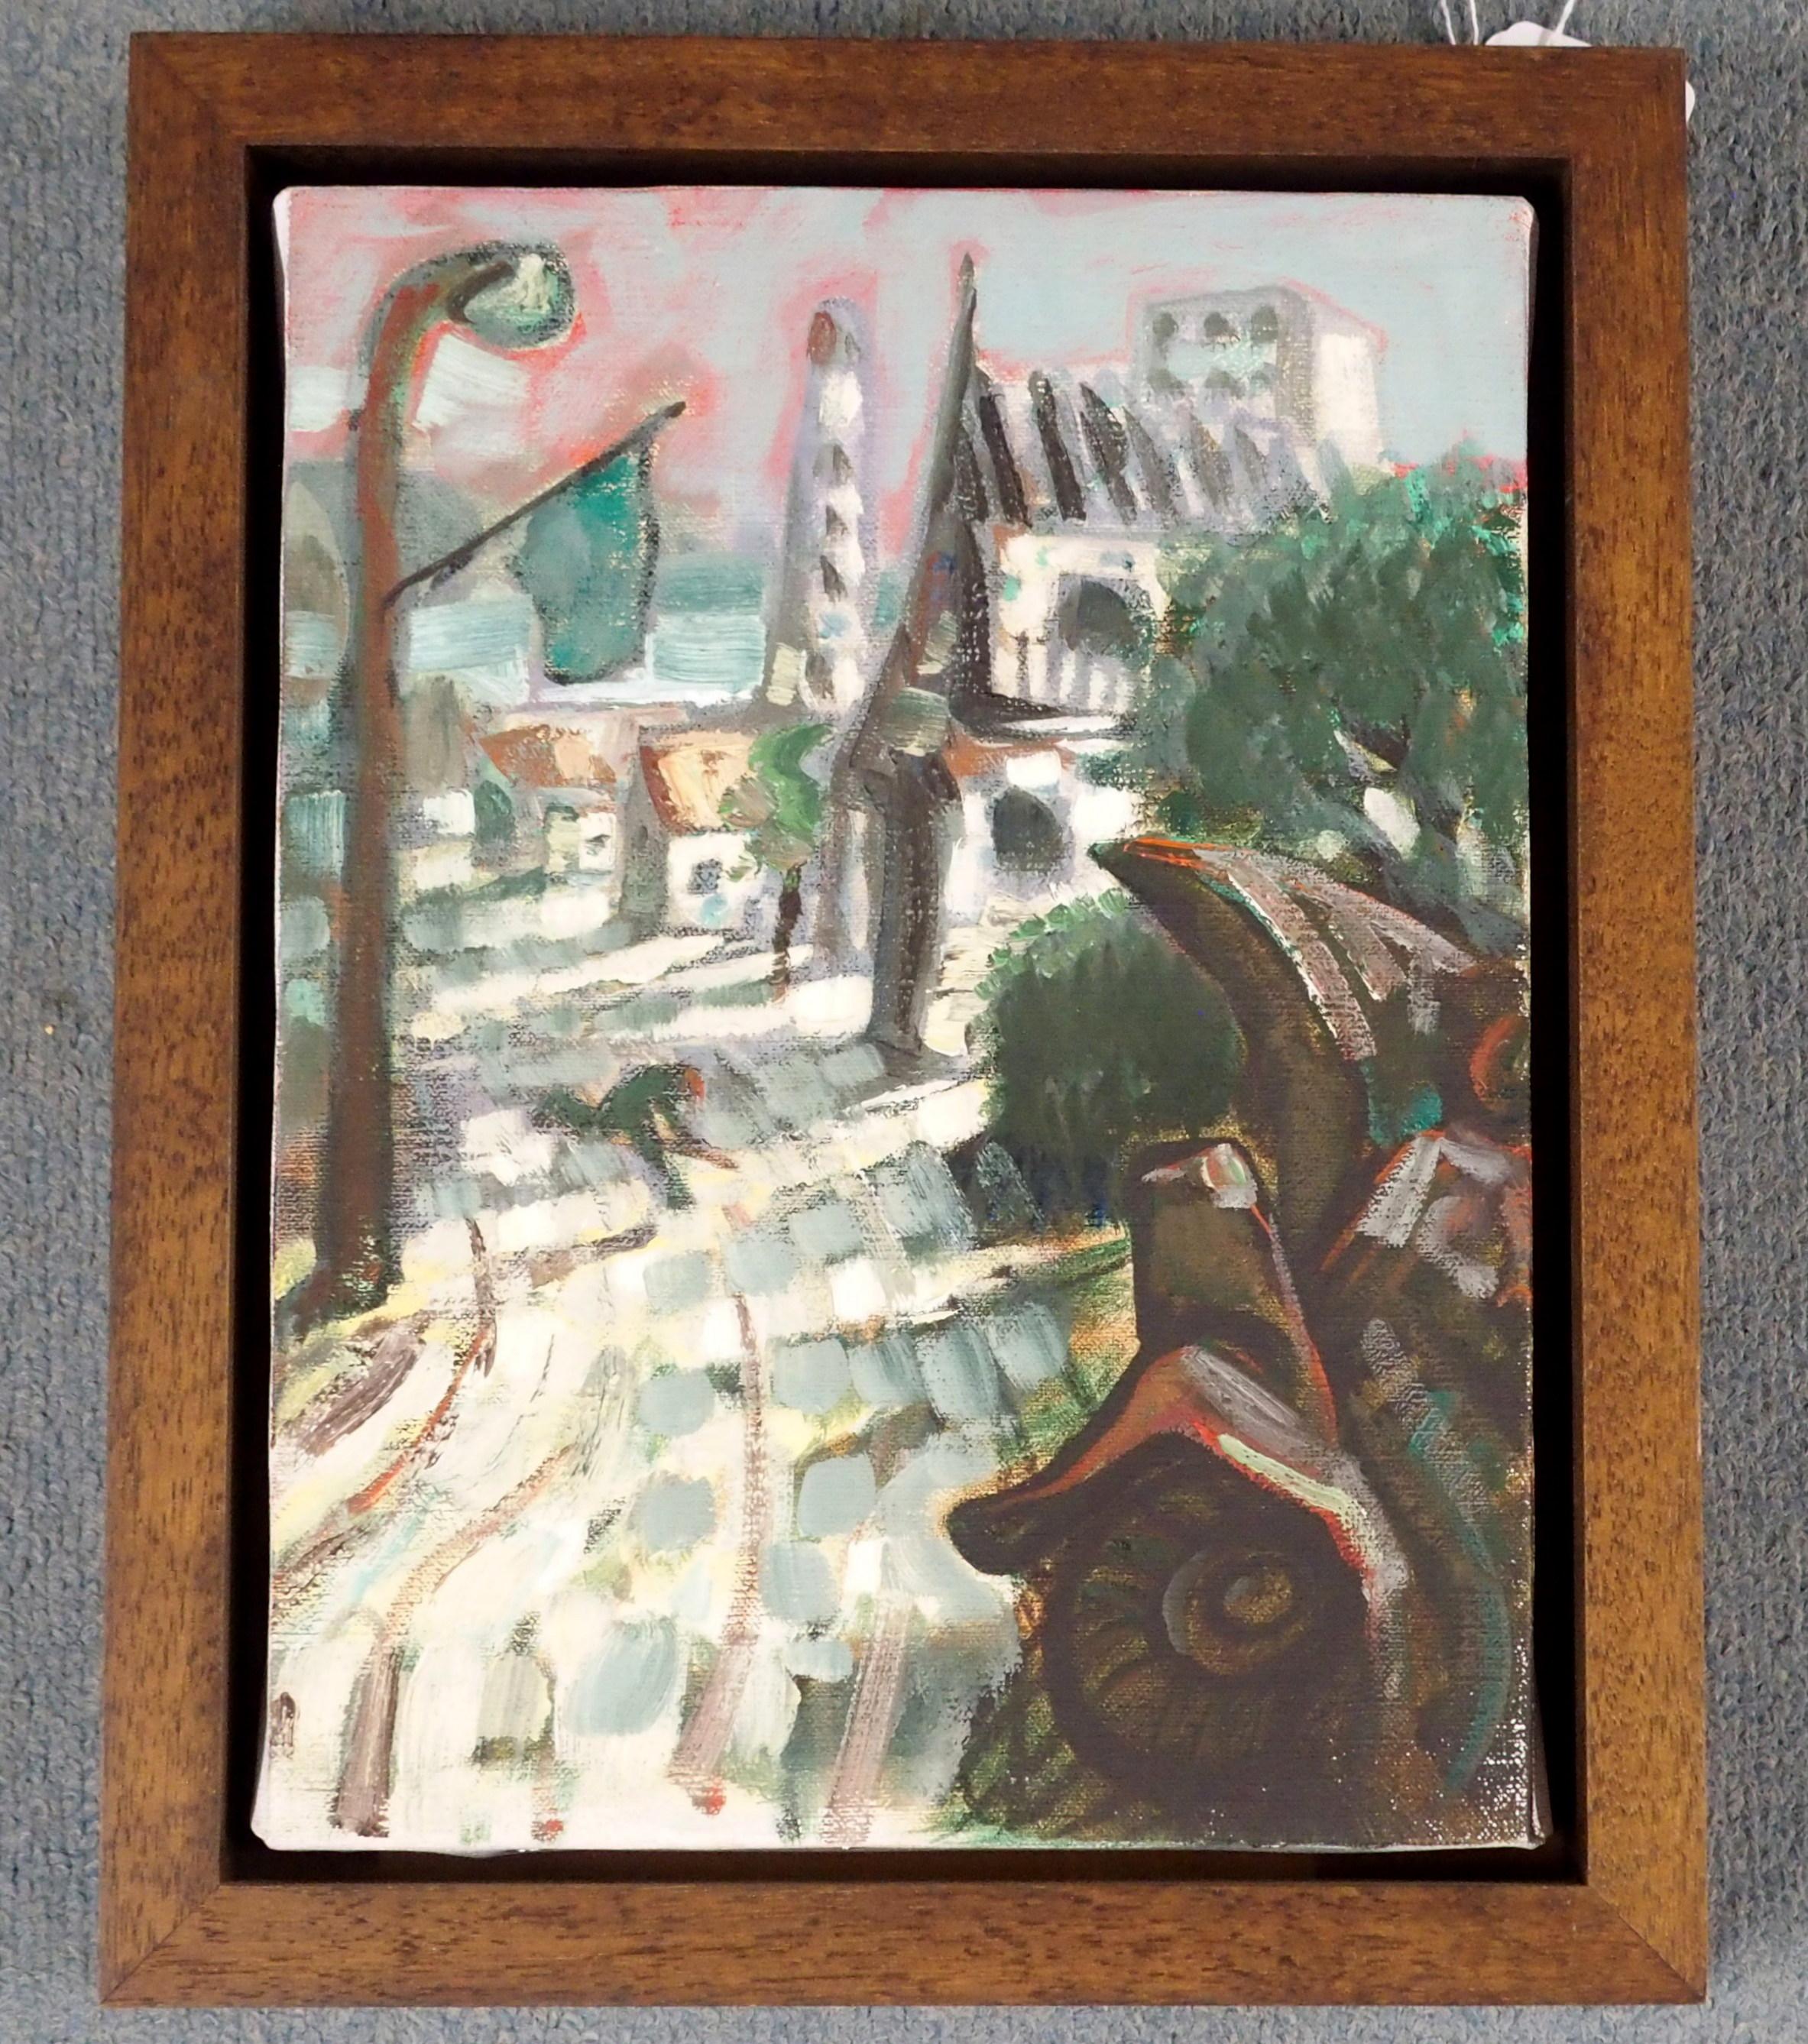 "•PETER HOWSON OBE (SCOTTISH B. 1958) STARI VITEZ Oil on canvas, 30.5 x 23cm (12 x 8 1/2"") - Image 2 of 4"